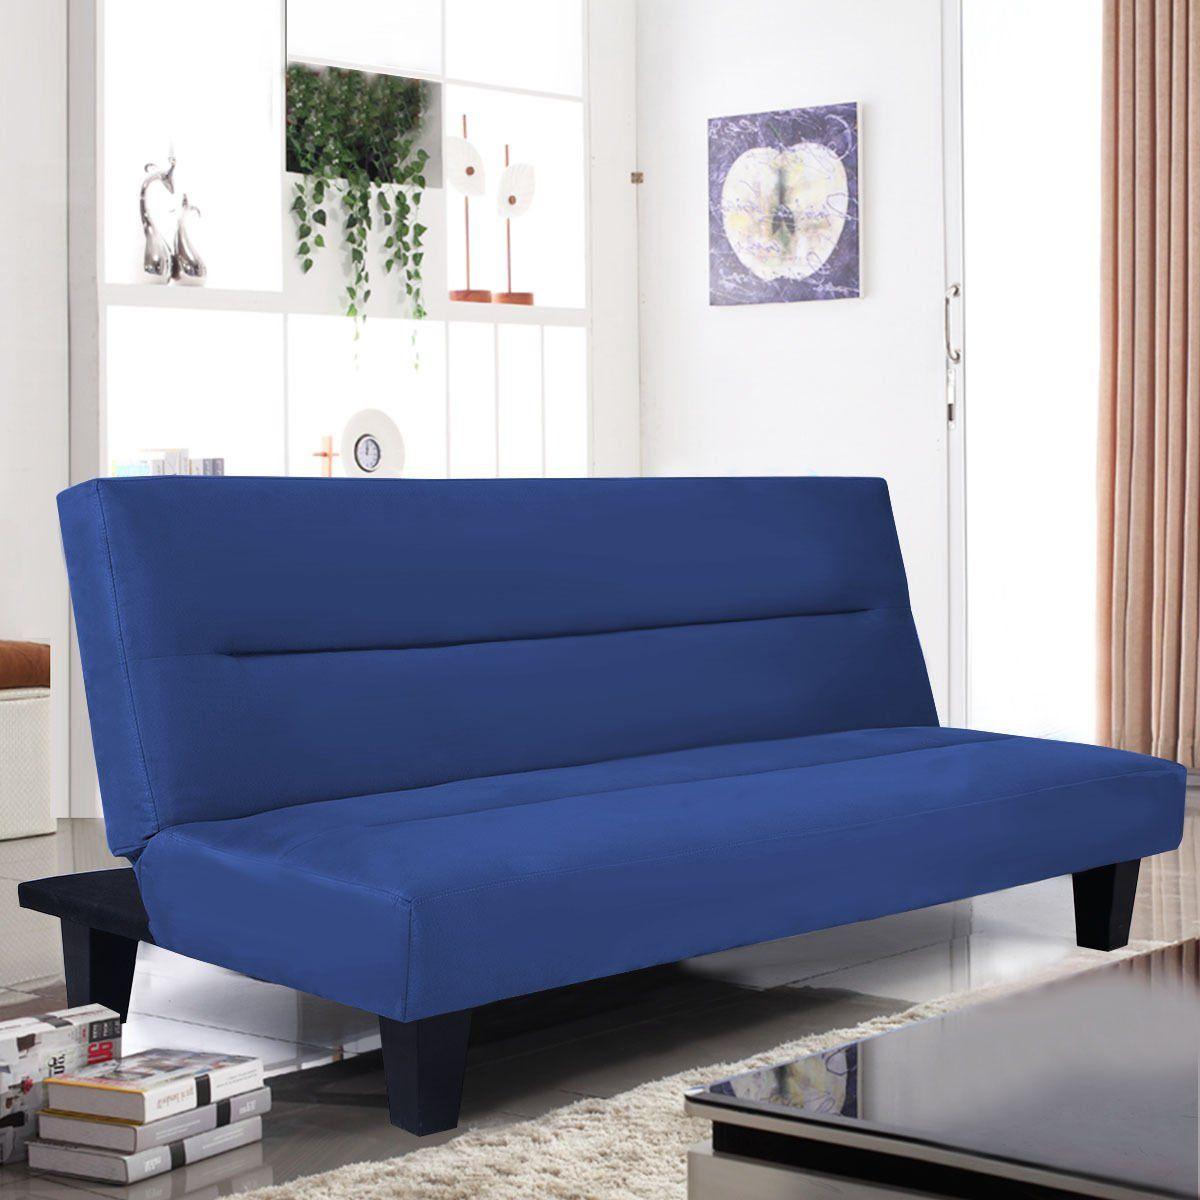 microfiber futon folding couch blue sofa bed w 6 mattress sleep